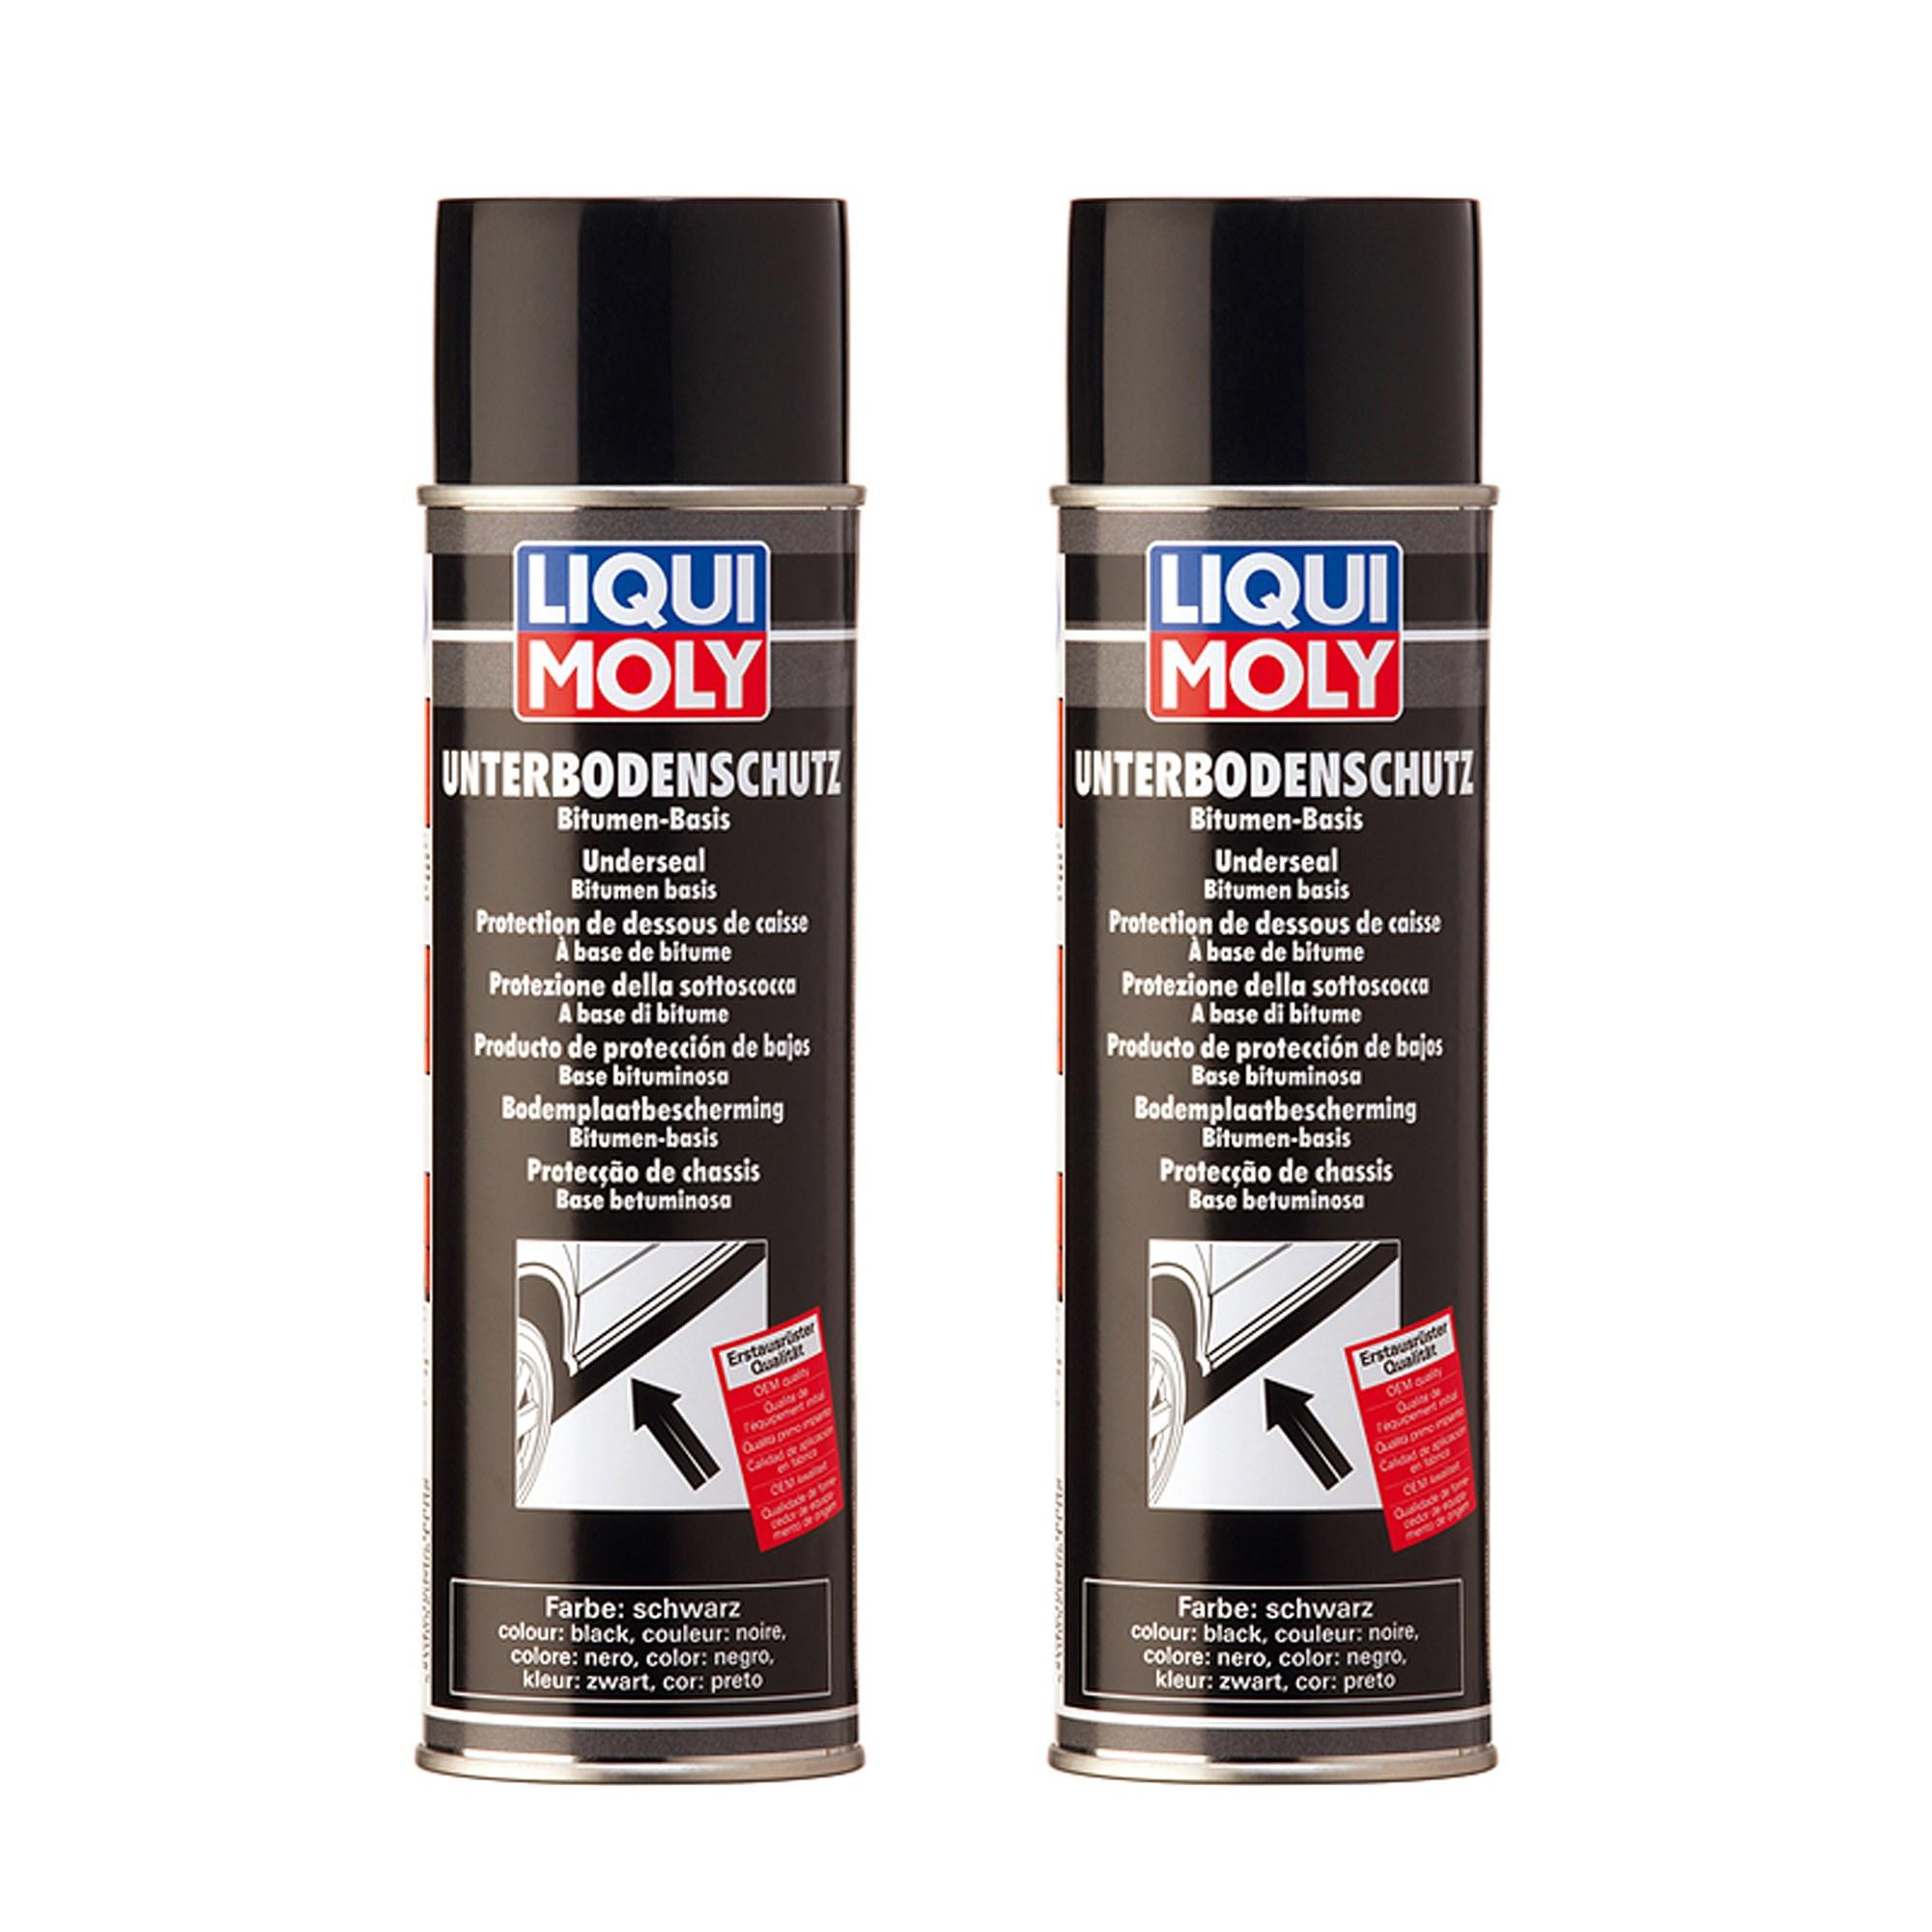 liqui moly 2x 500ml unterboden schutz bitumen schwarz atp autoteile. Black Bedroom Furniture Sets. Home Design Ideas